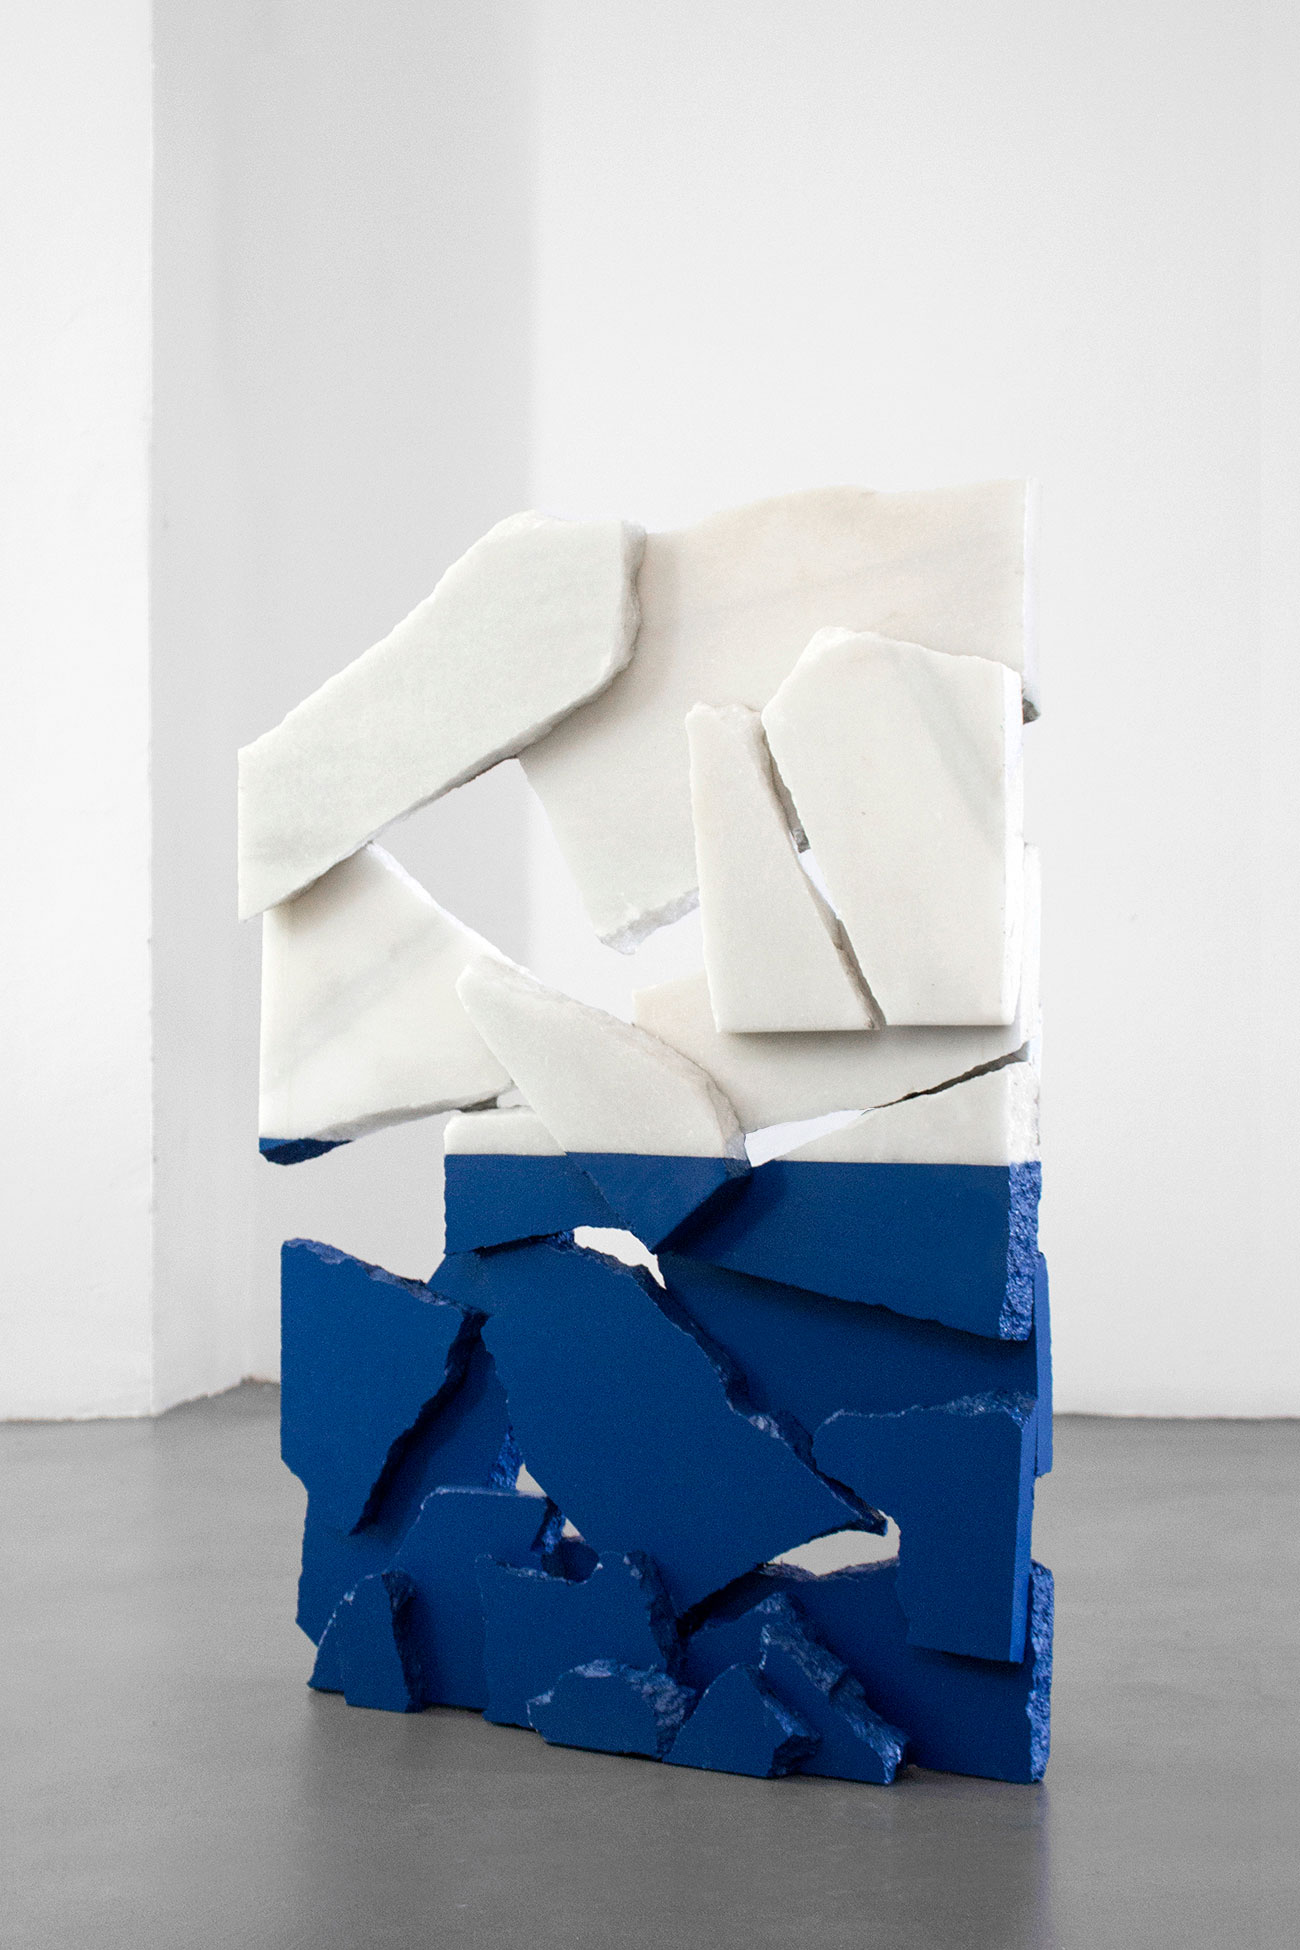 Carla Cascales' Sculpture Project, Tribute to Ana Maria Matute   Yellowtrace